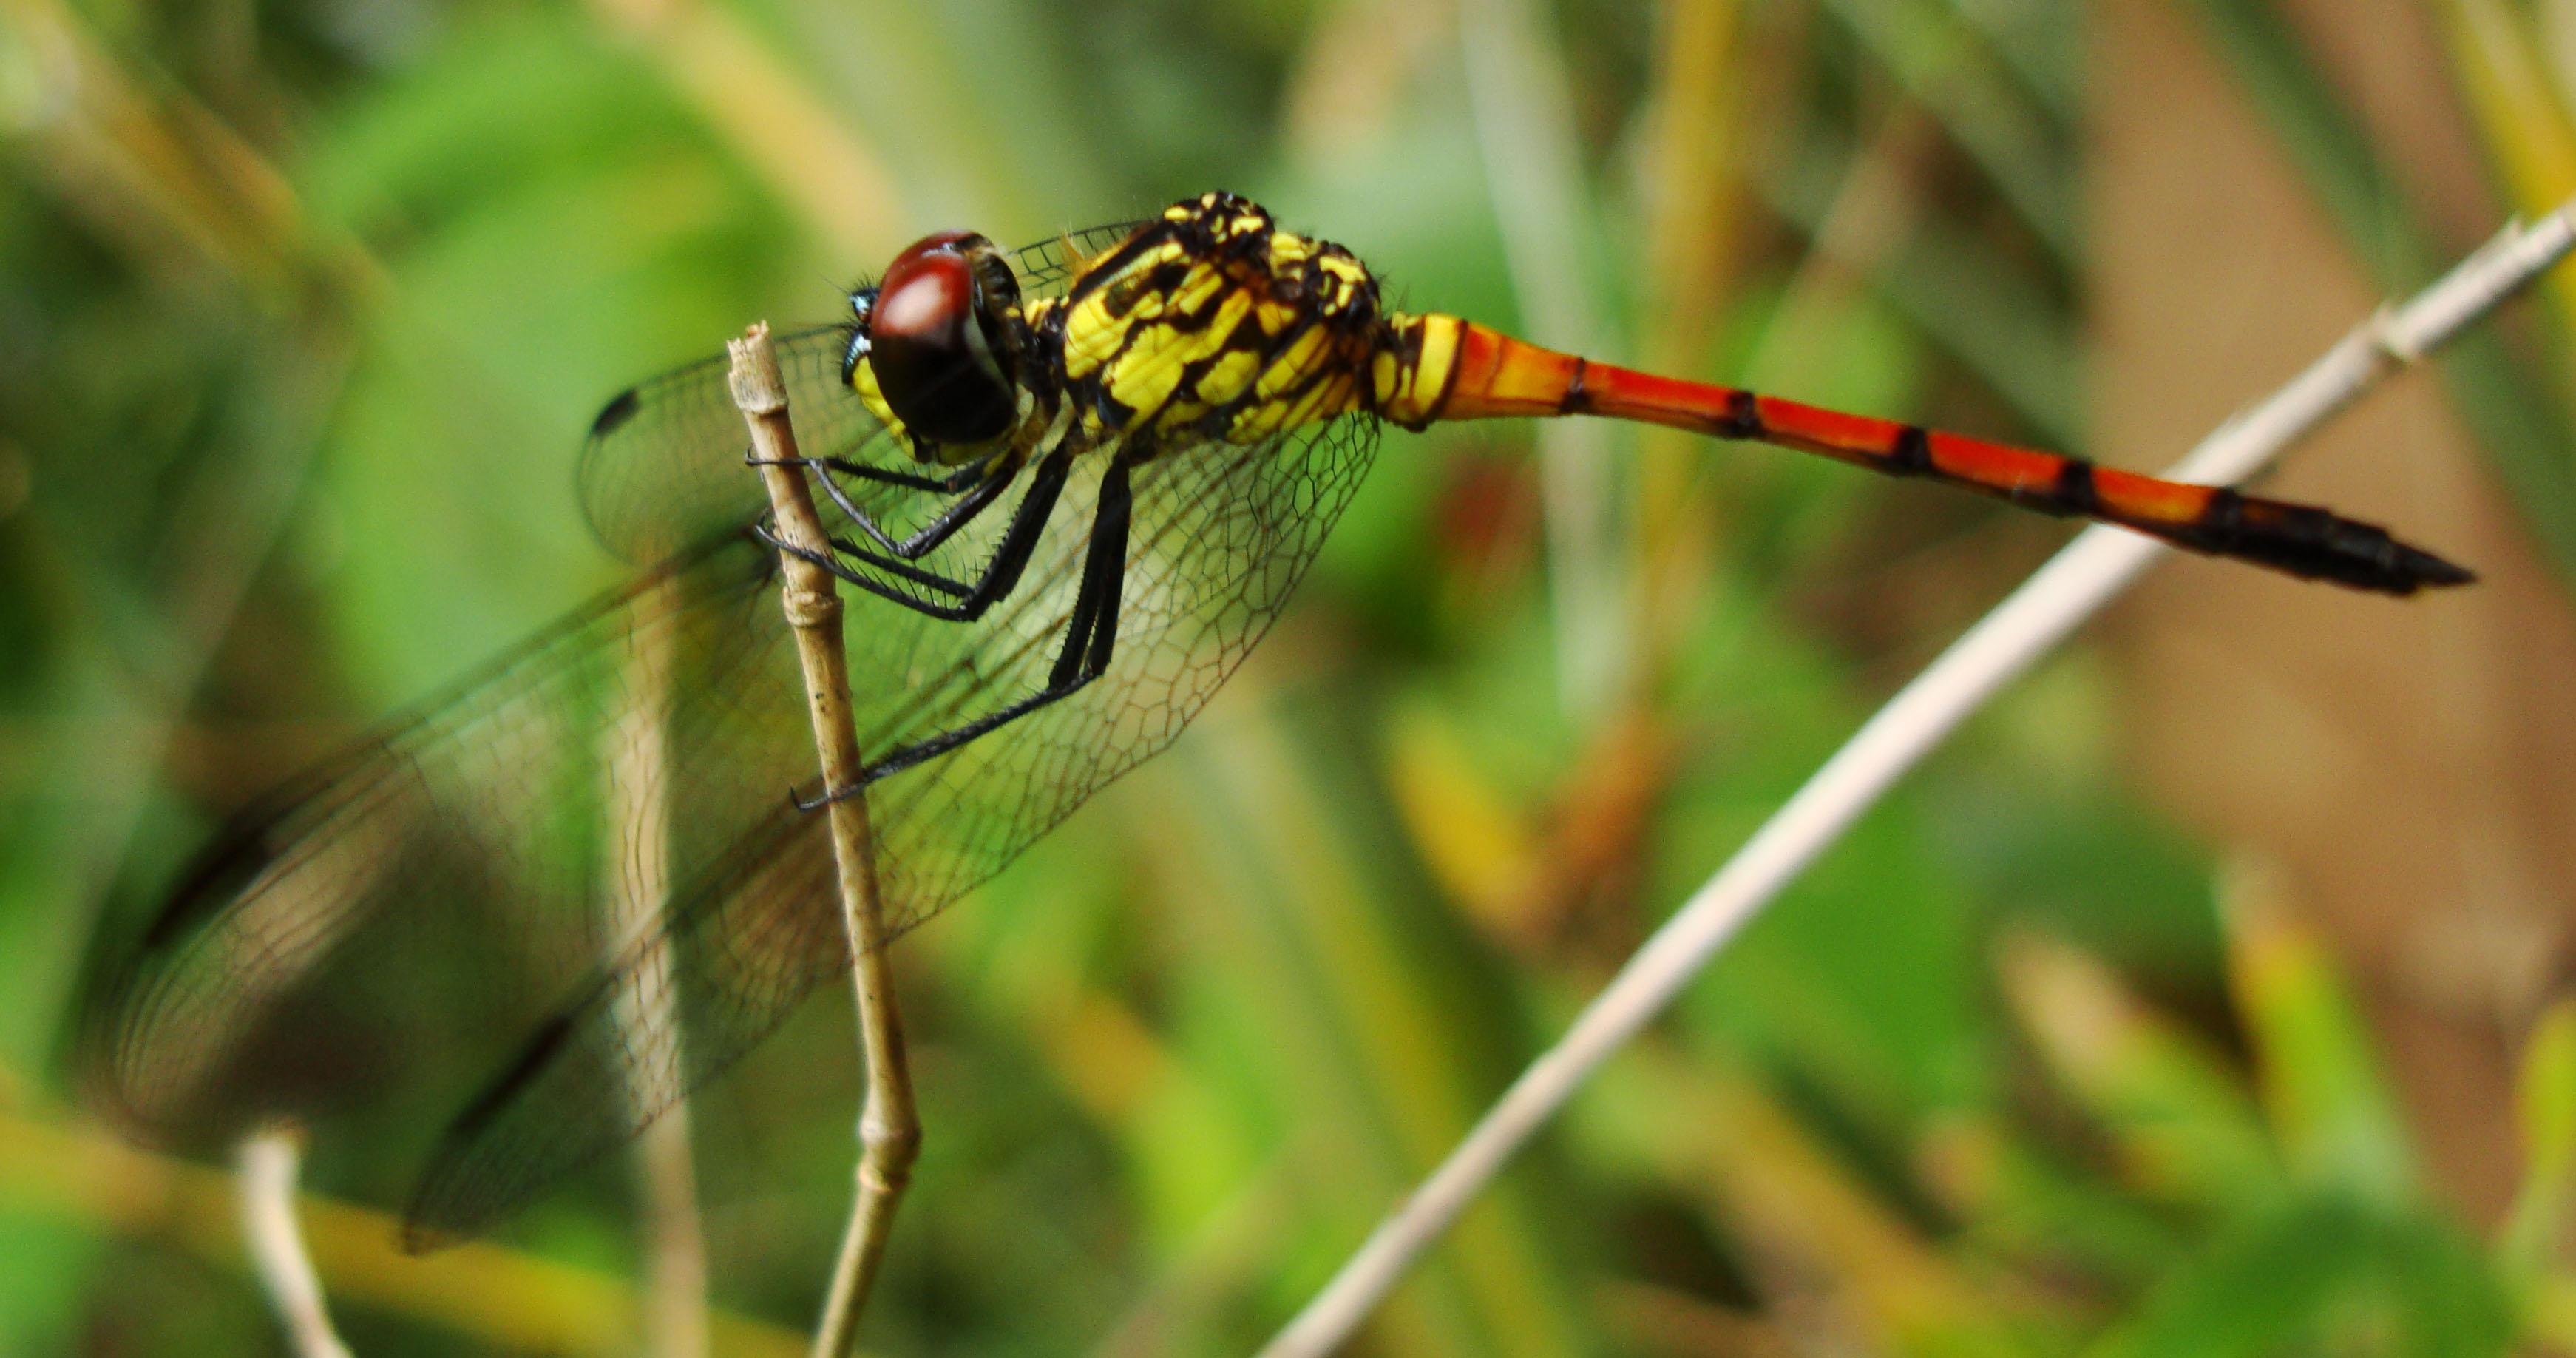 Libellulidae Red Swampdragon Agrionoptera insignis allogenes Sunshine Coast Qld Australia 034